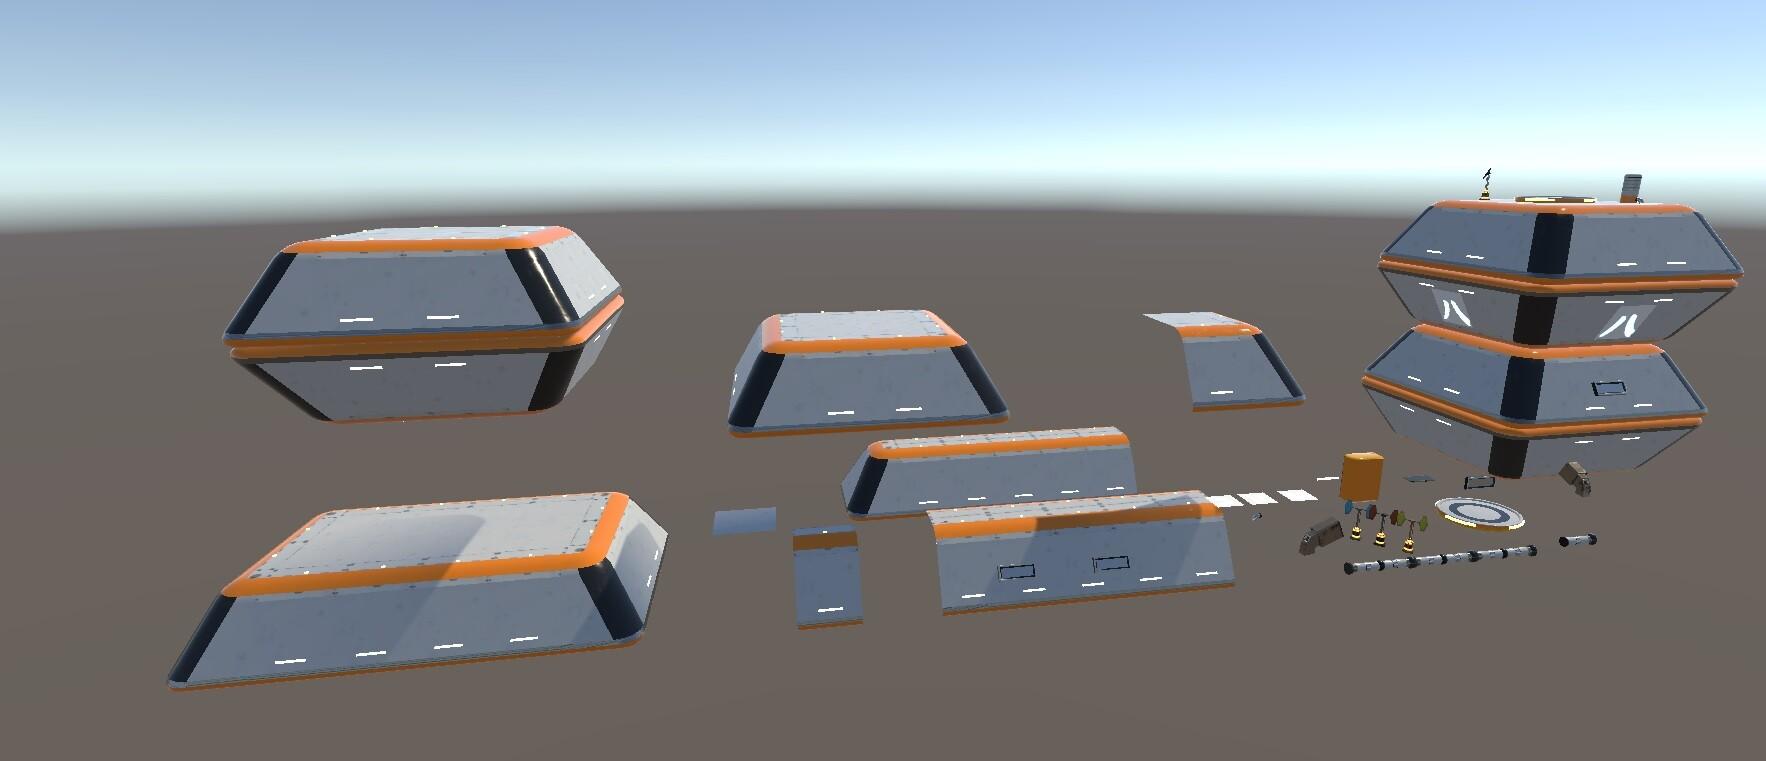 Enrico ottonello screenshot10 sci fi building exterior pack gameartifact